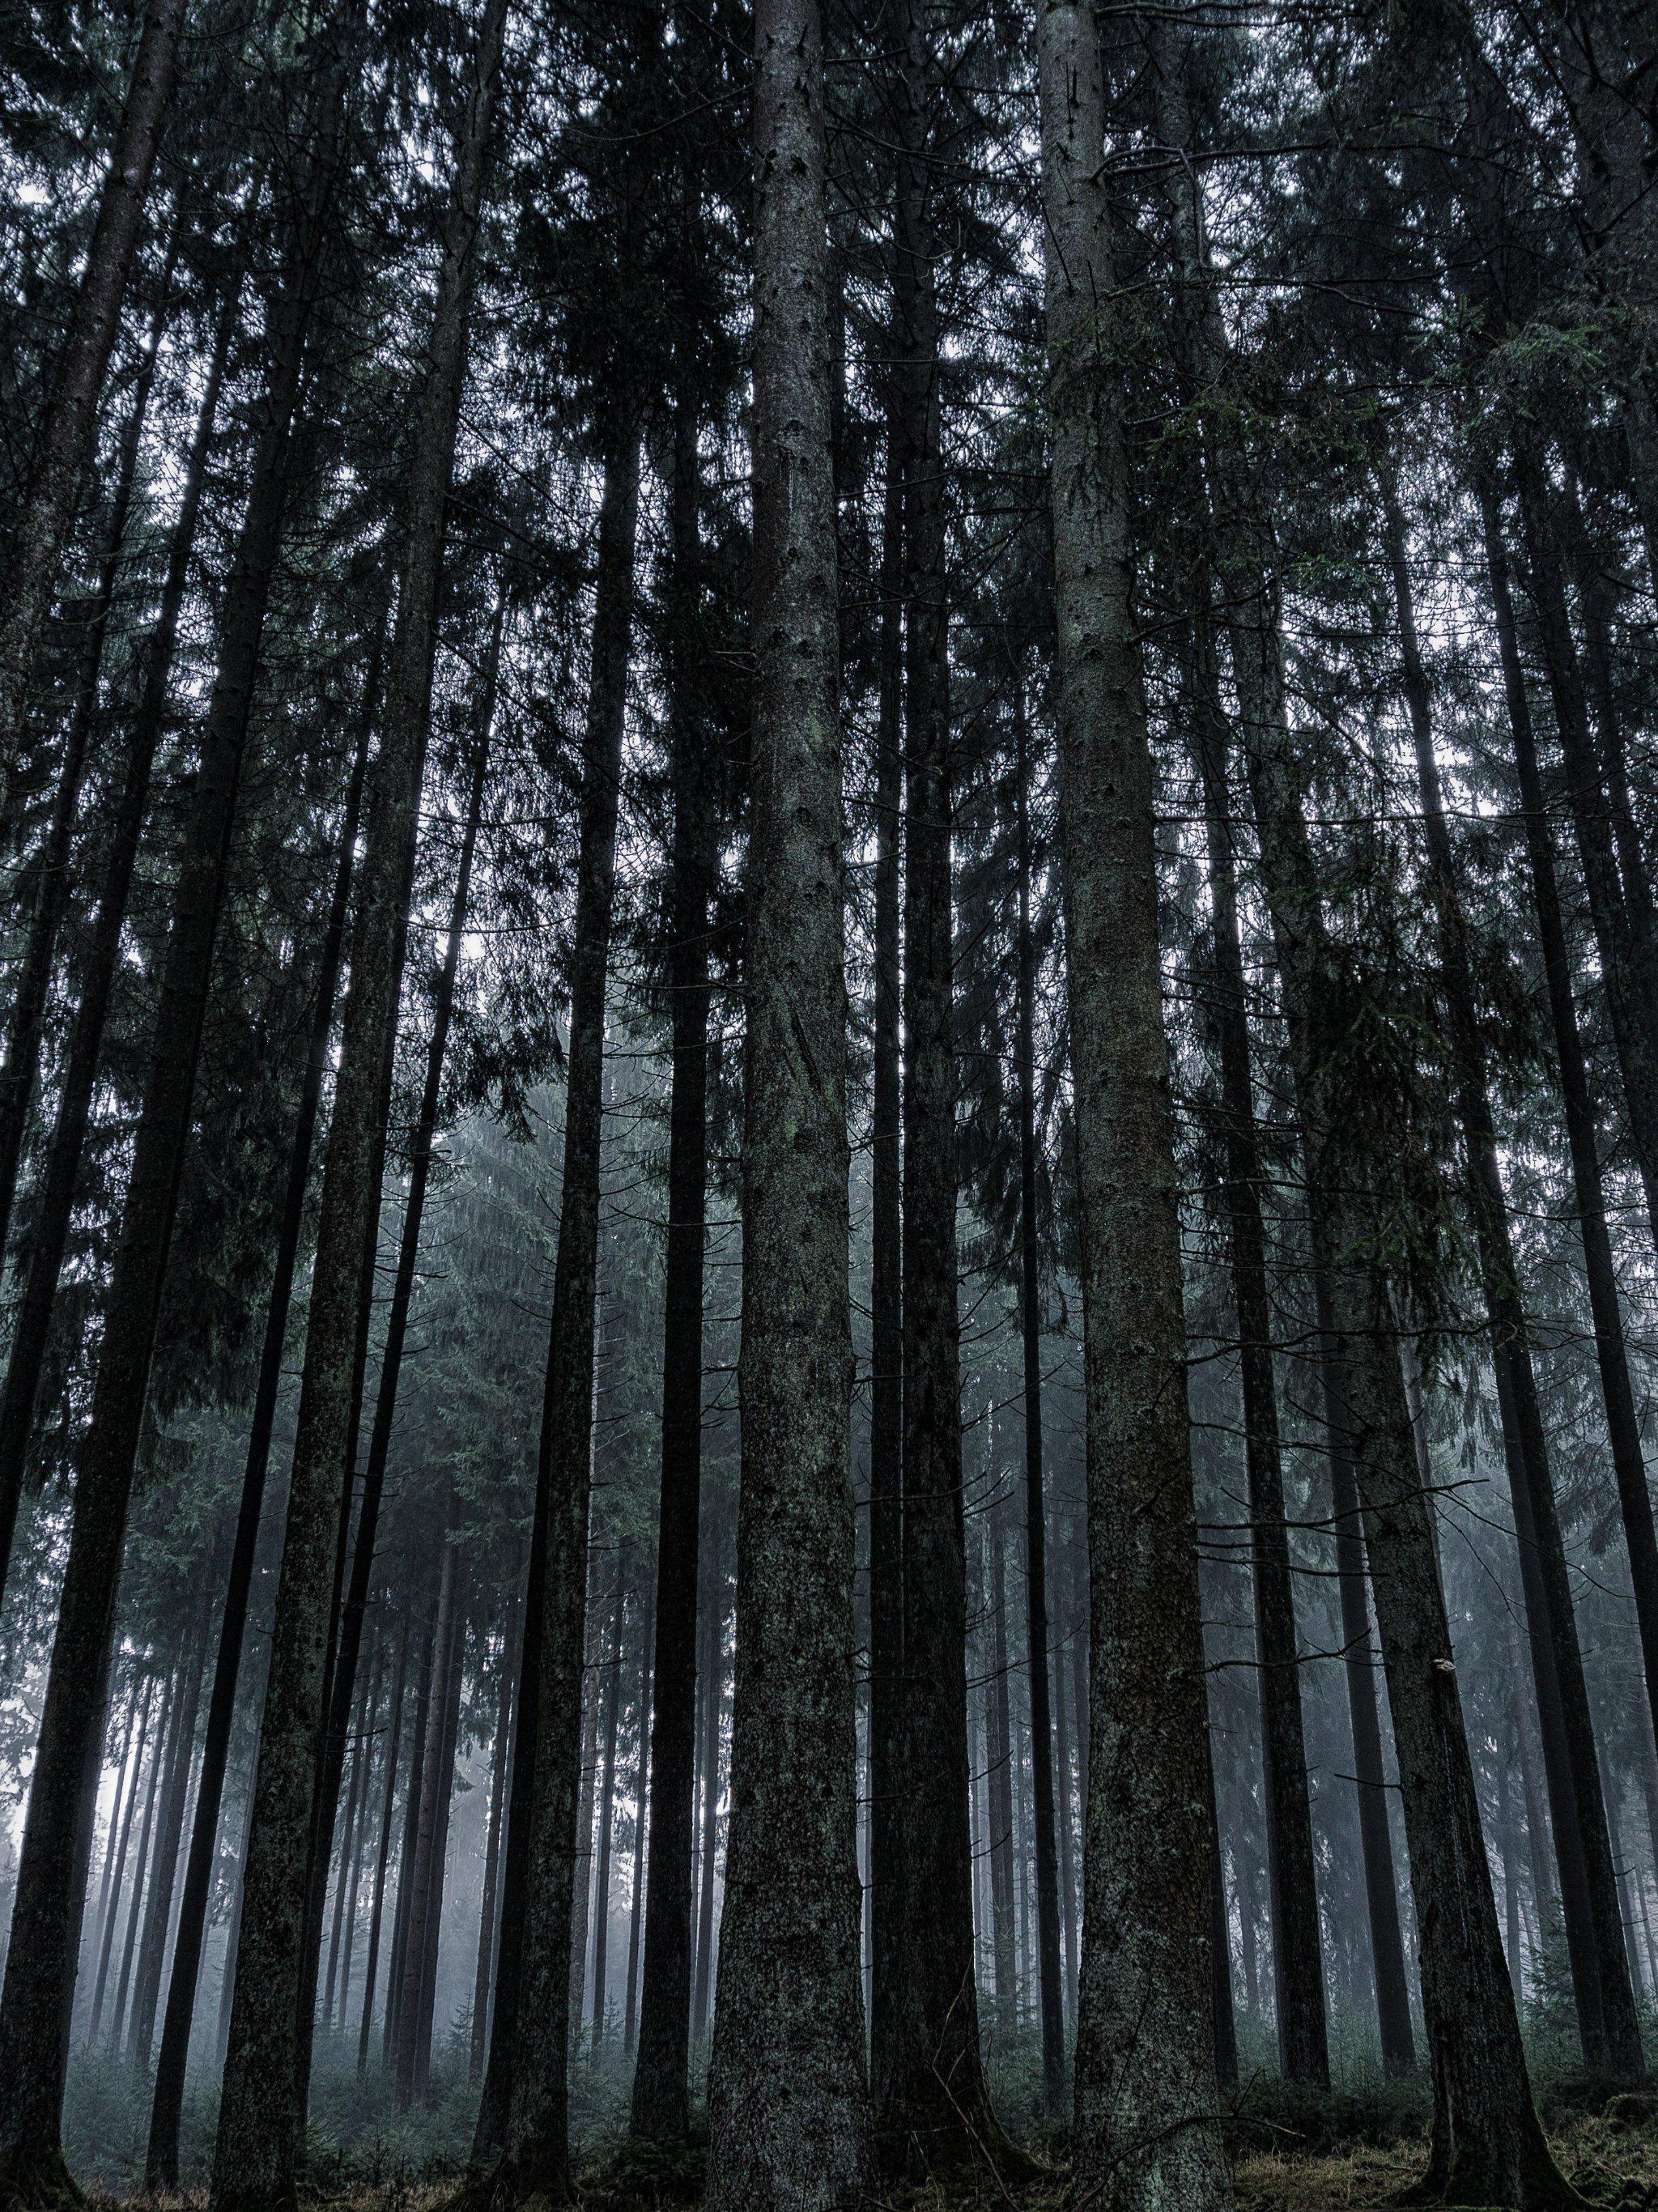 Dark Forest Wallpaper Iphone Android Desktop Backgrounds